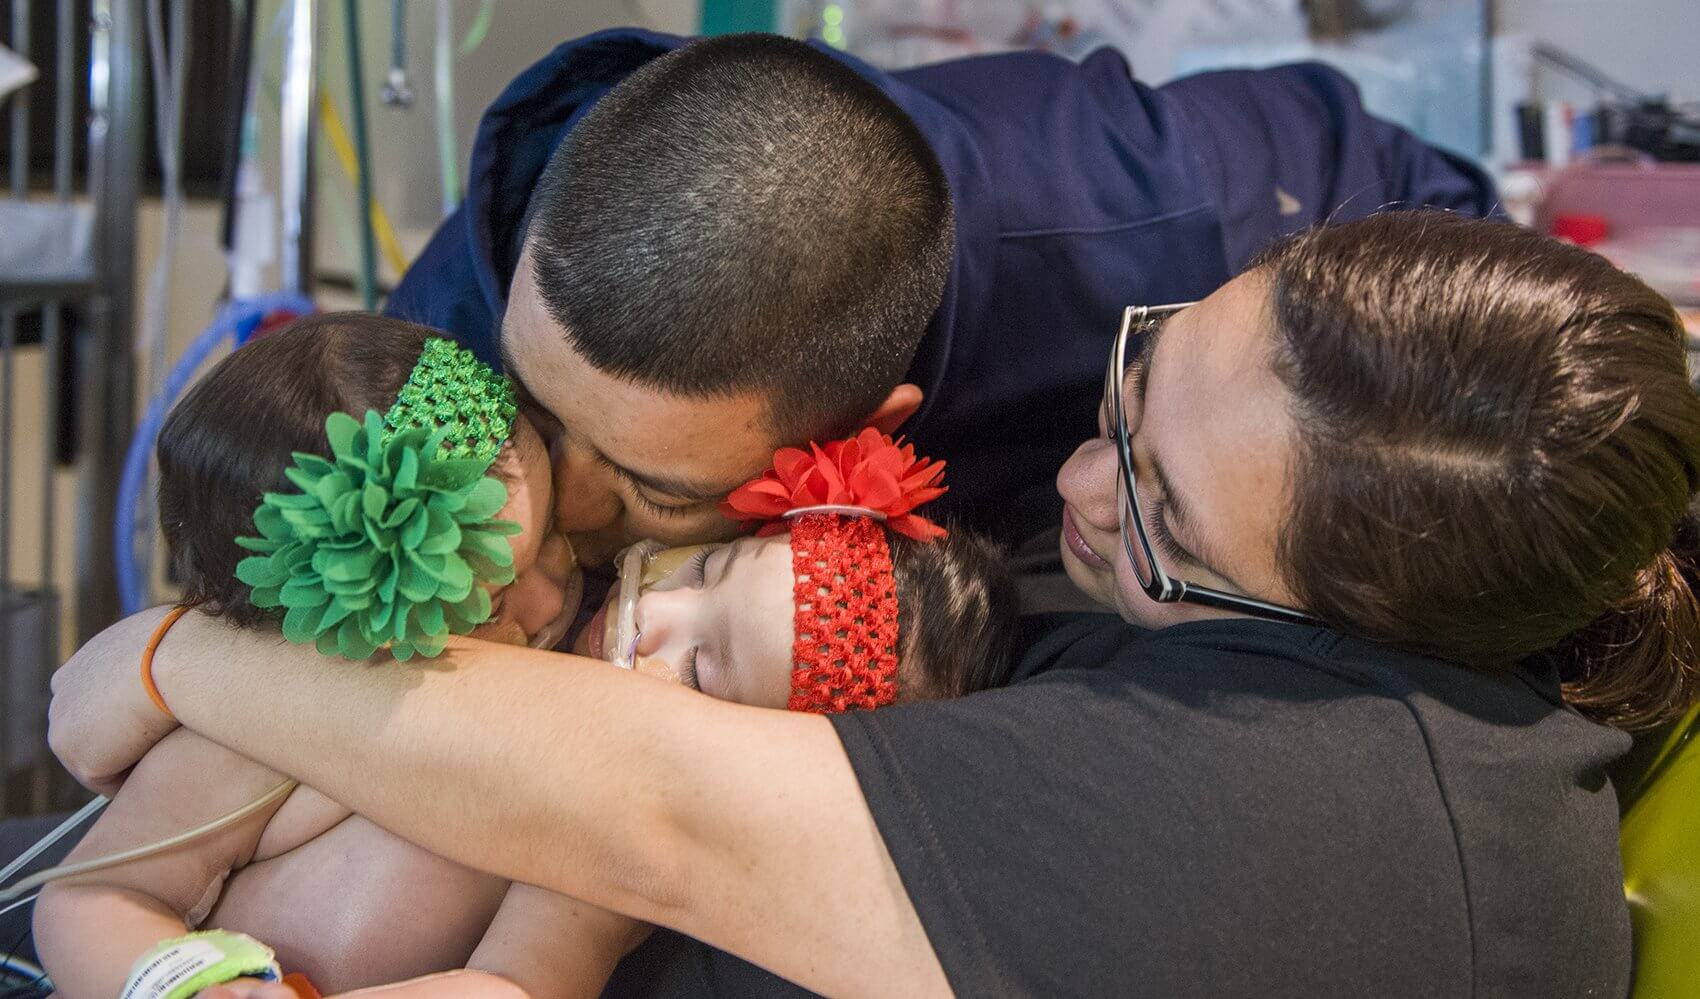 Mother Elysse Mata and father John Eric Mata embrace the twins before surgery. (Credit: Allen S. Kramer/Texas Children's Hospital)